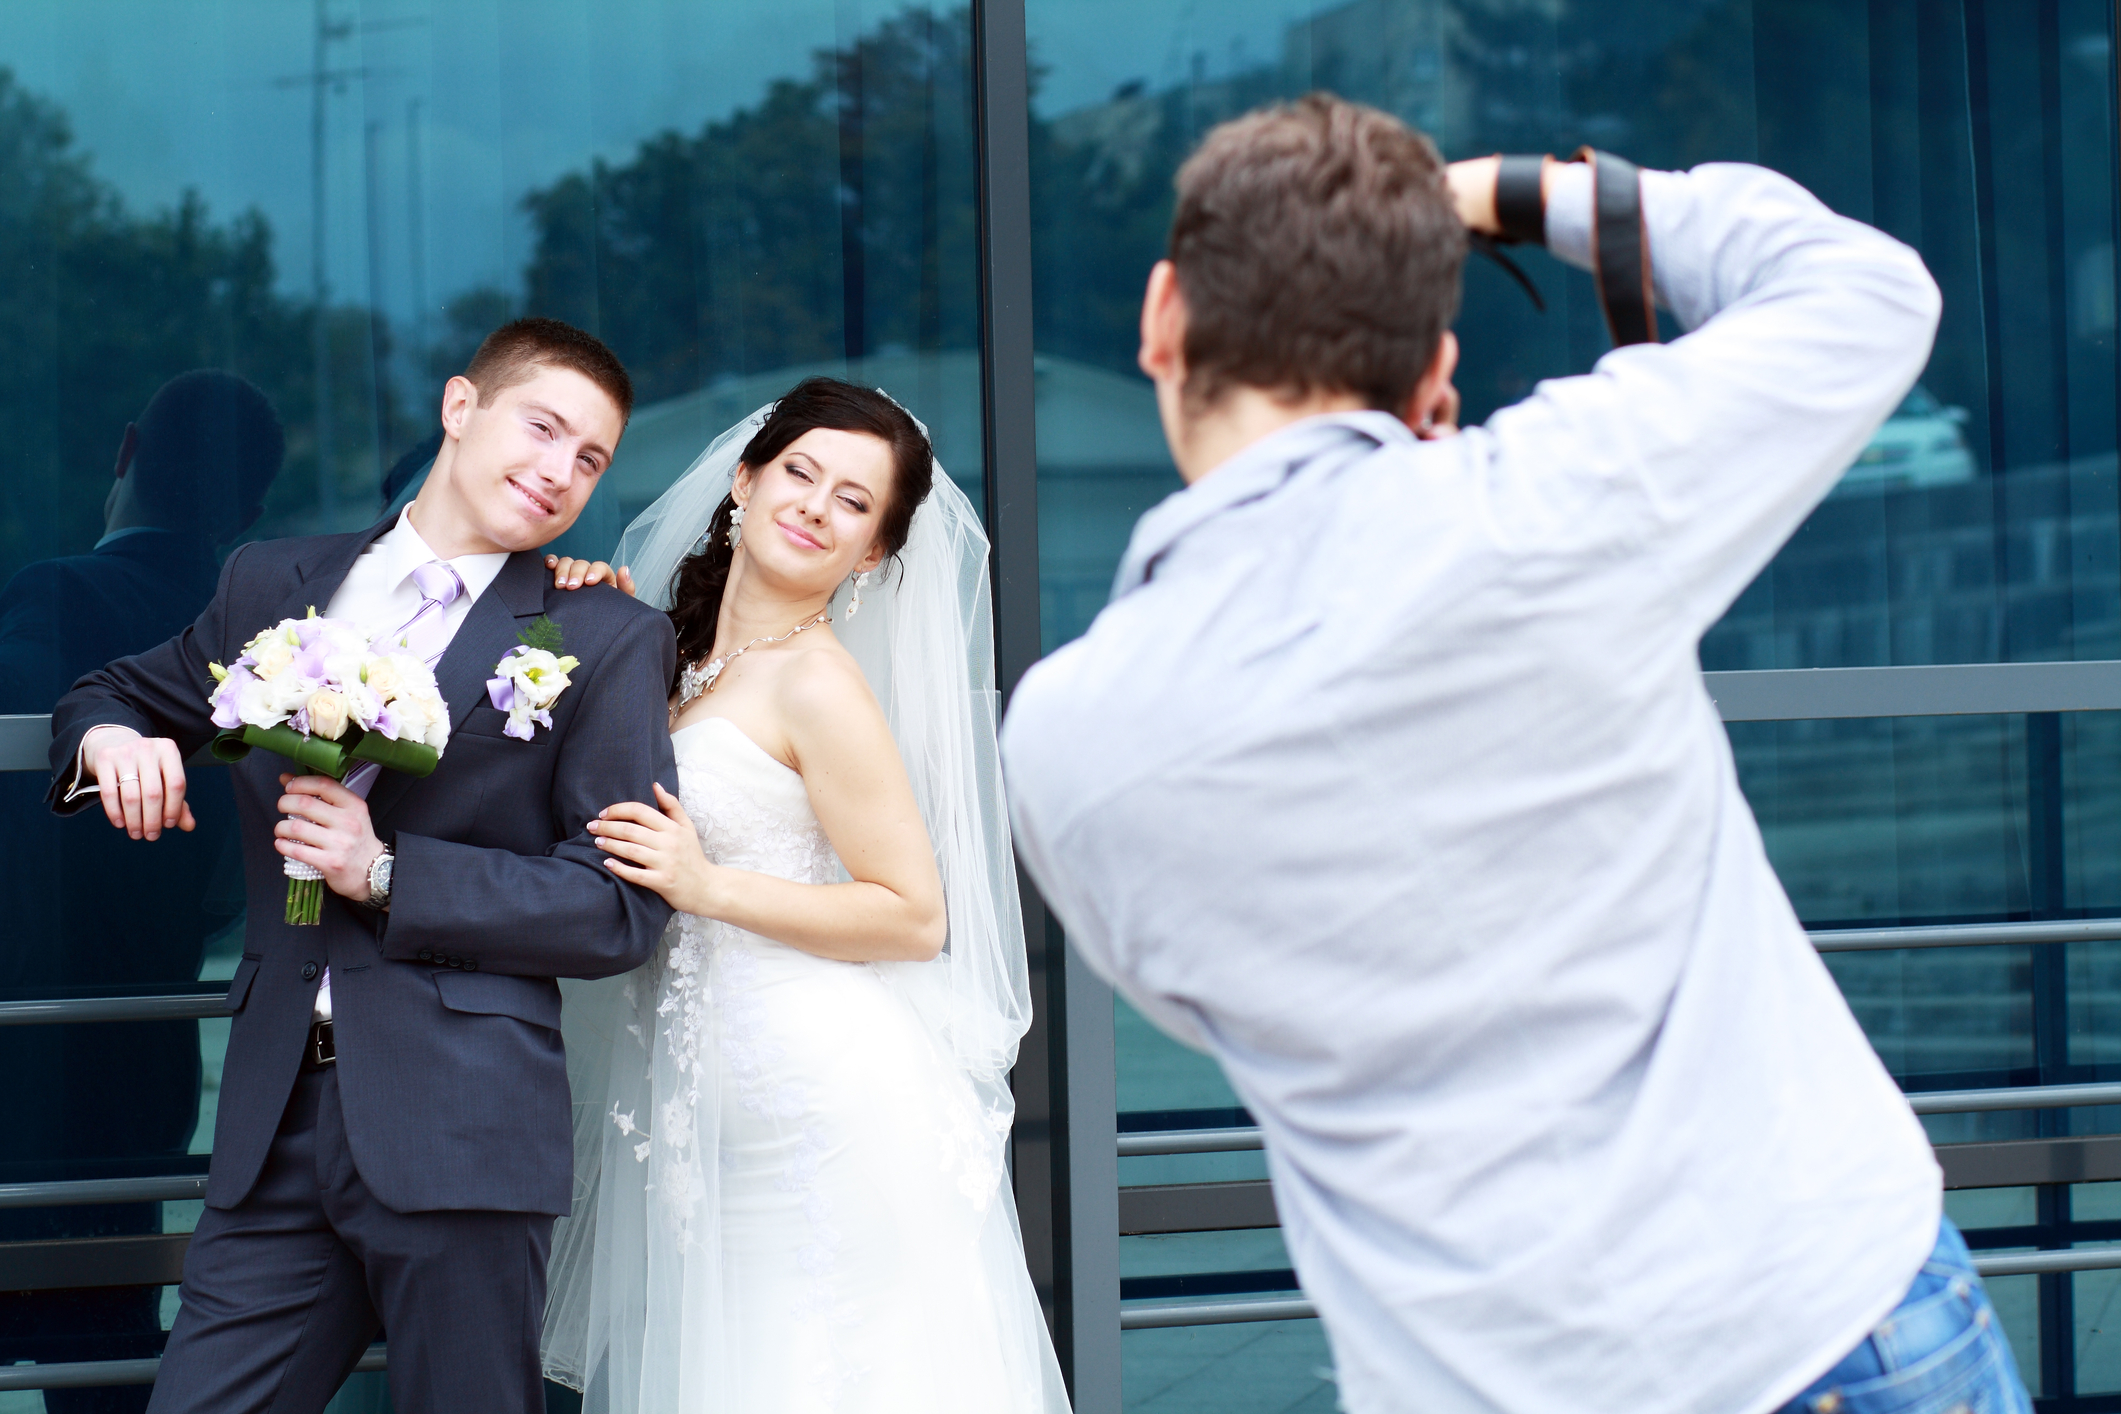 Couple posing for wedding photographs